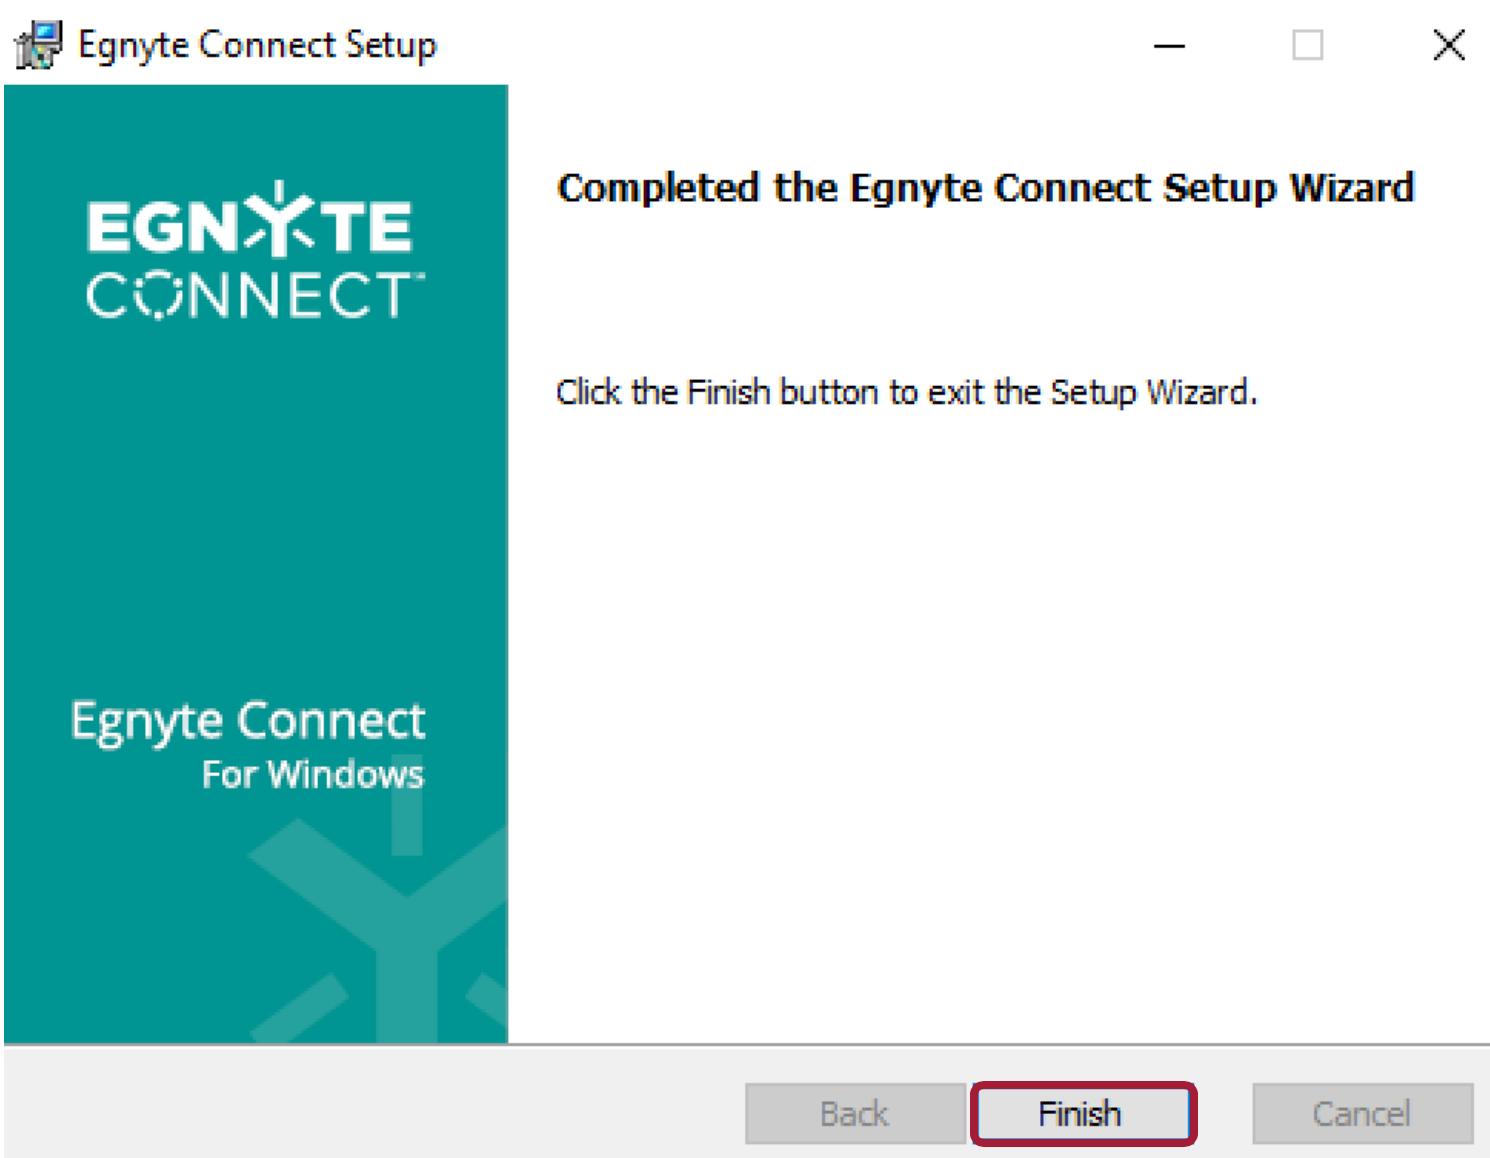 Desktop App for Windows Installation – Egnyte